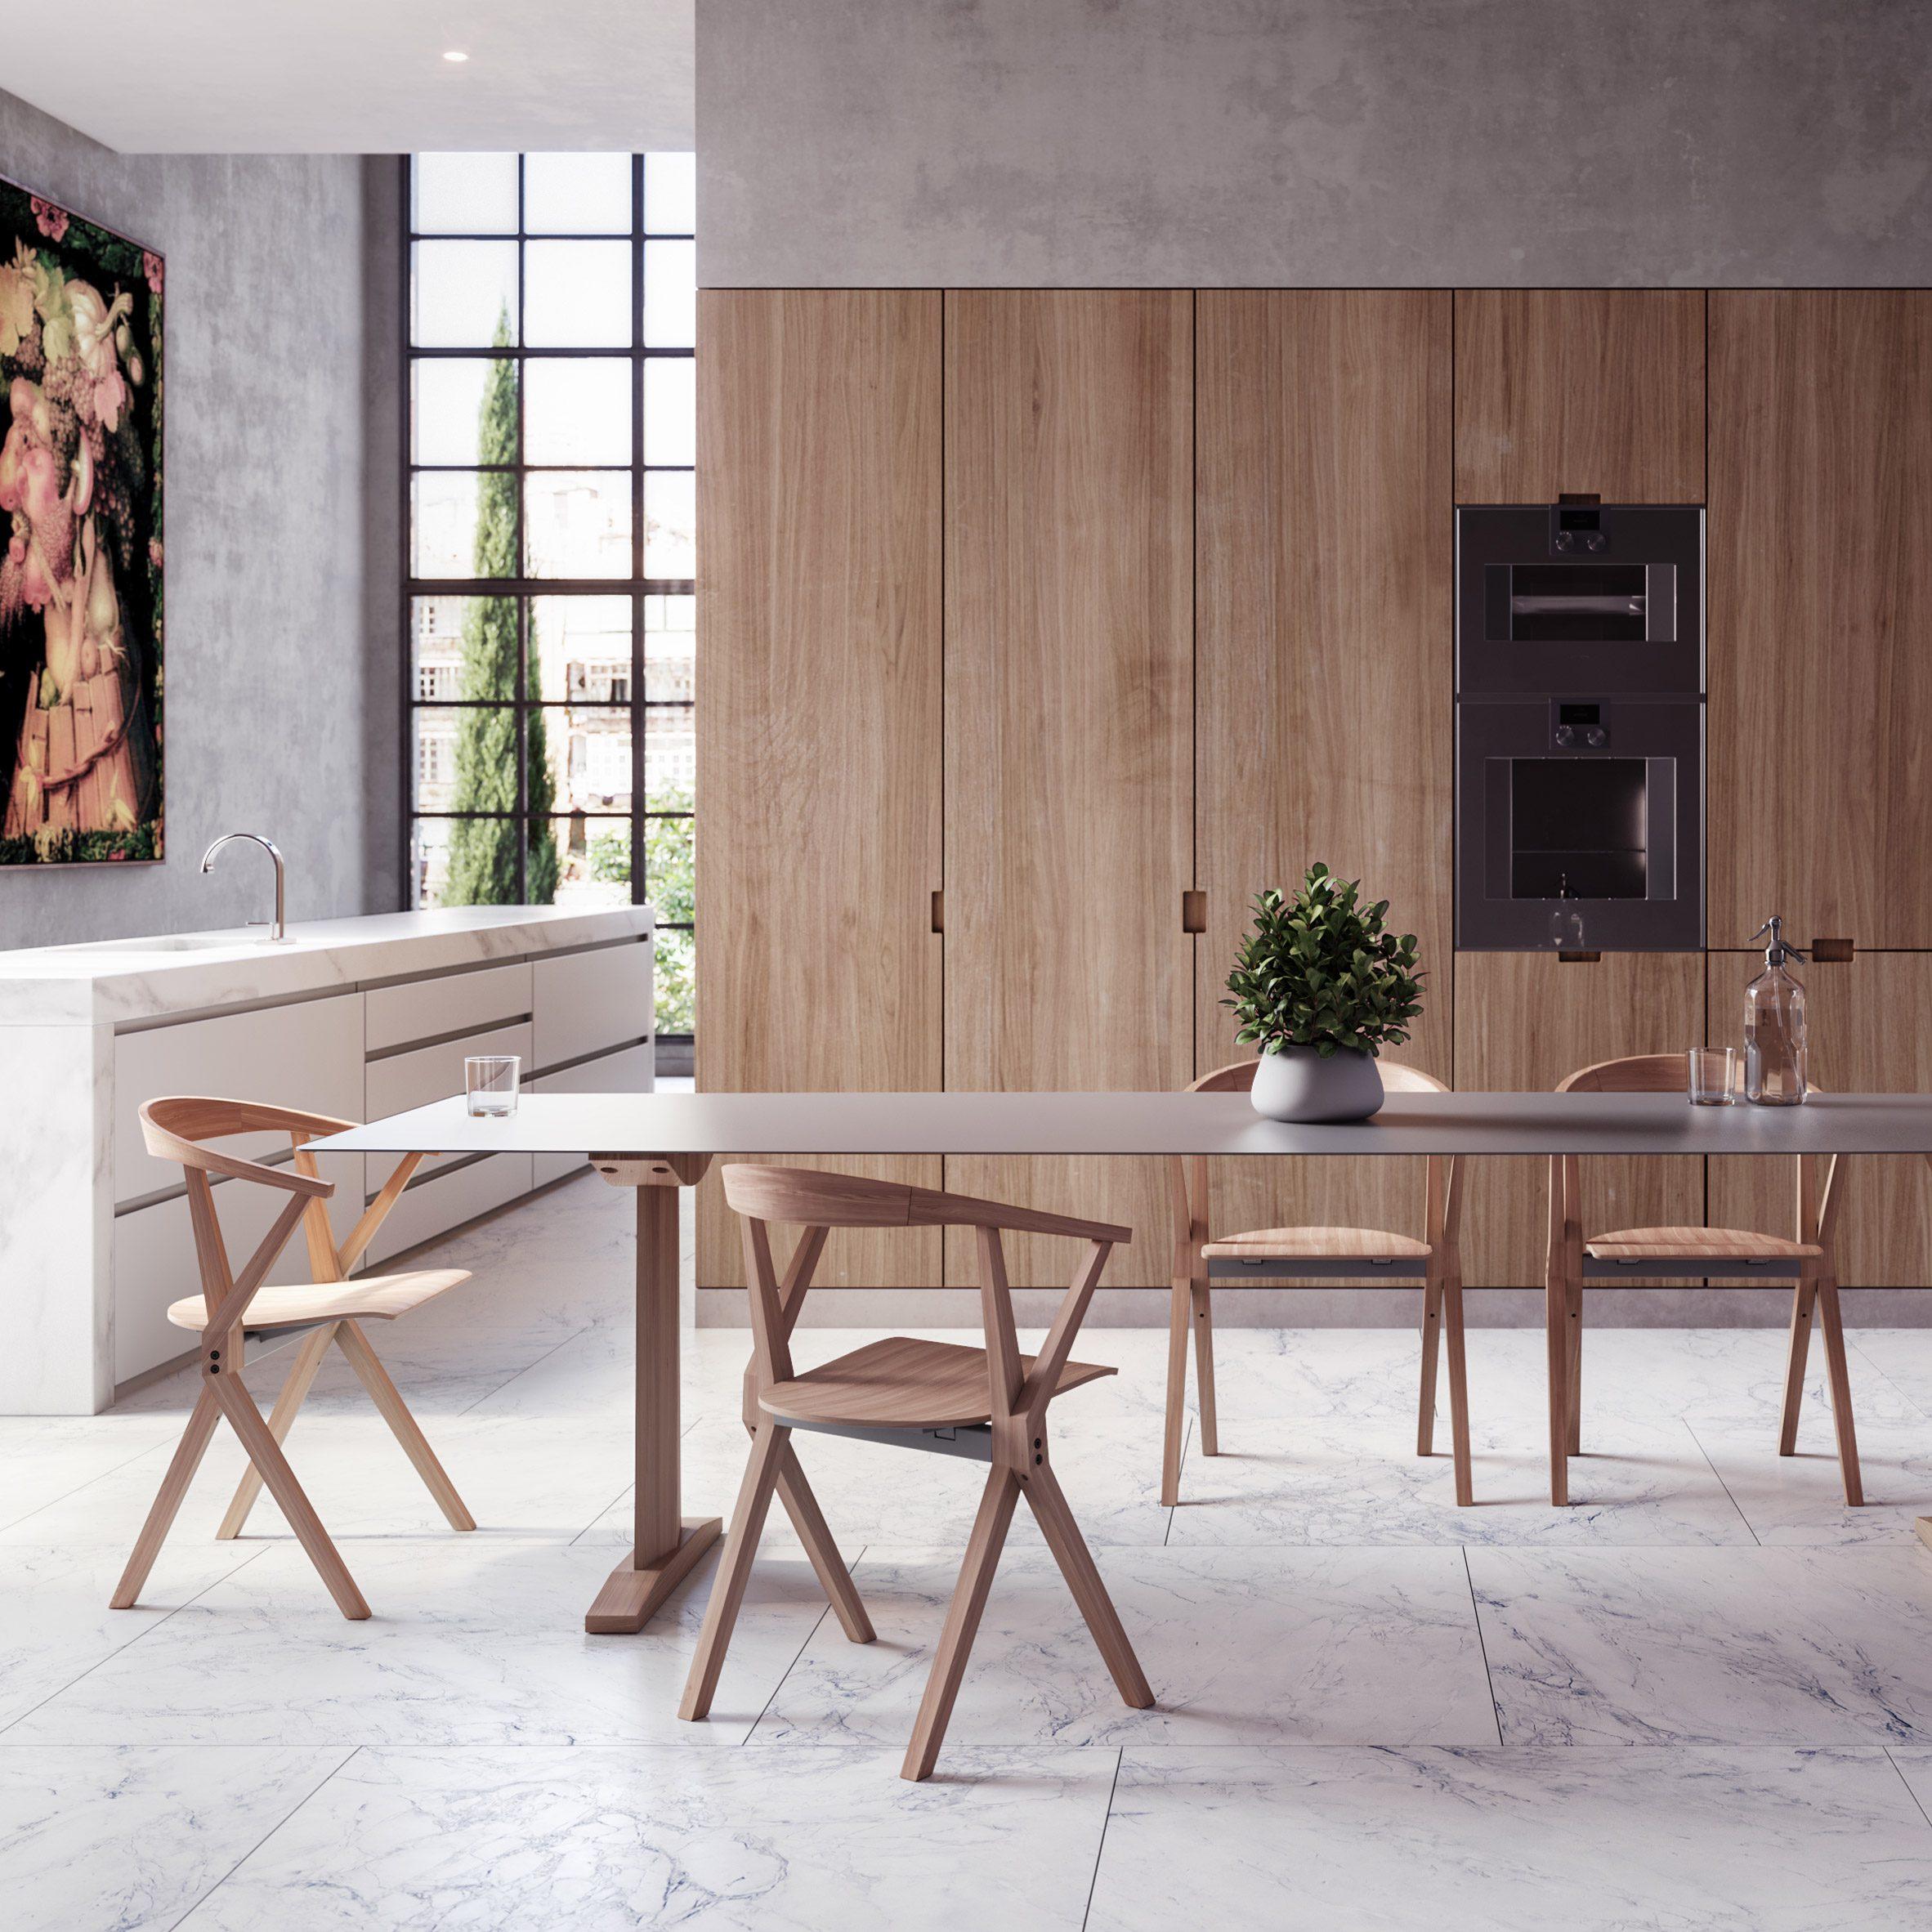 Table B by Konstantin Grcic for BD Barcelona